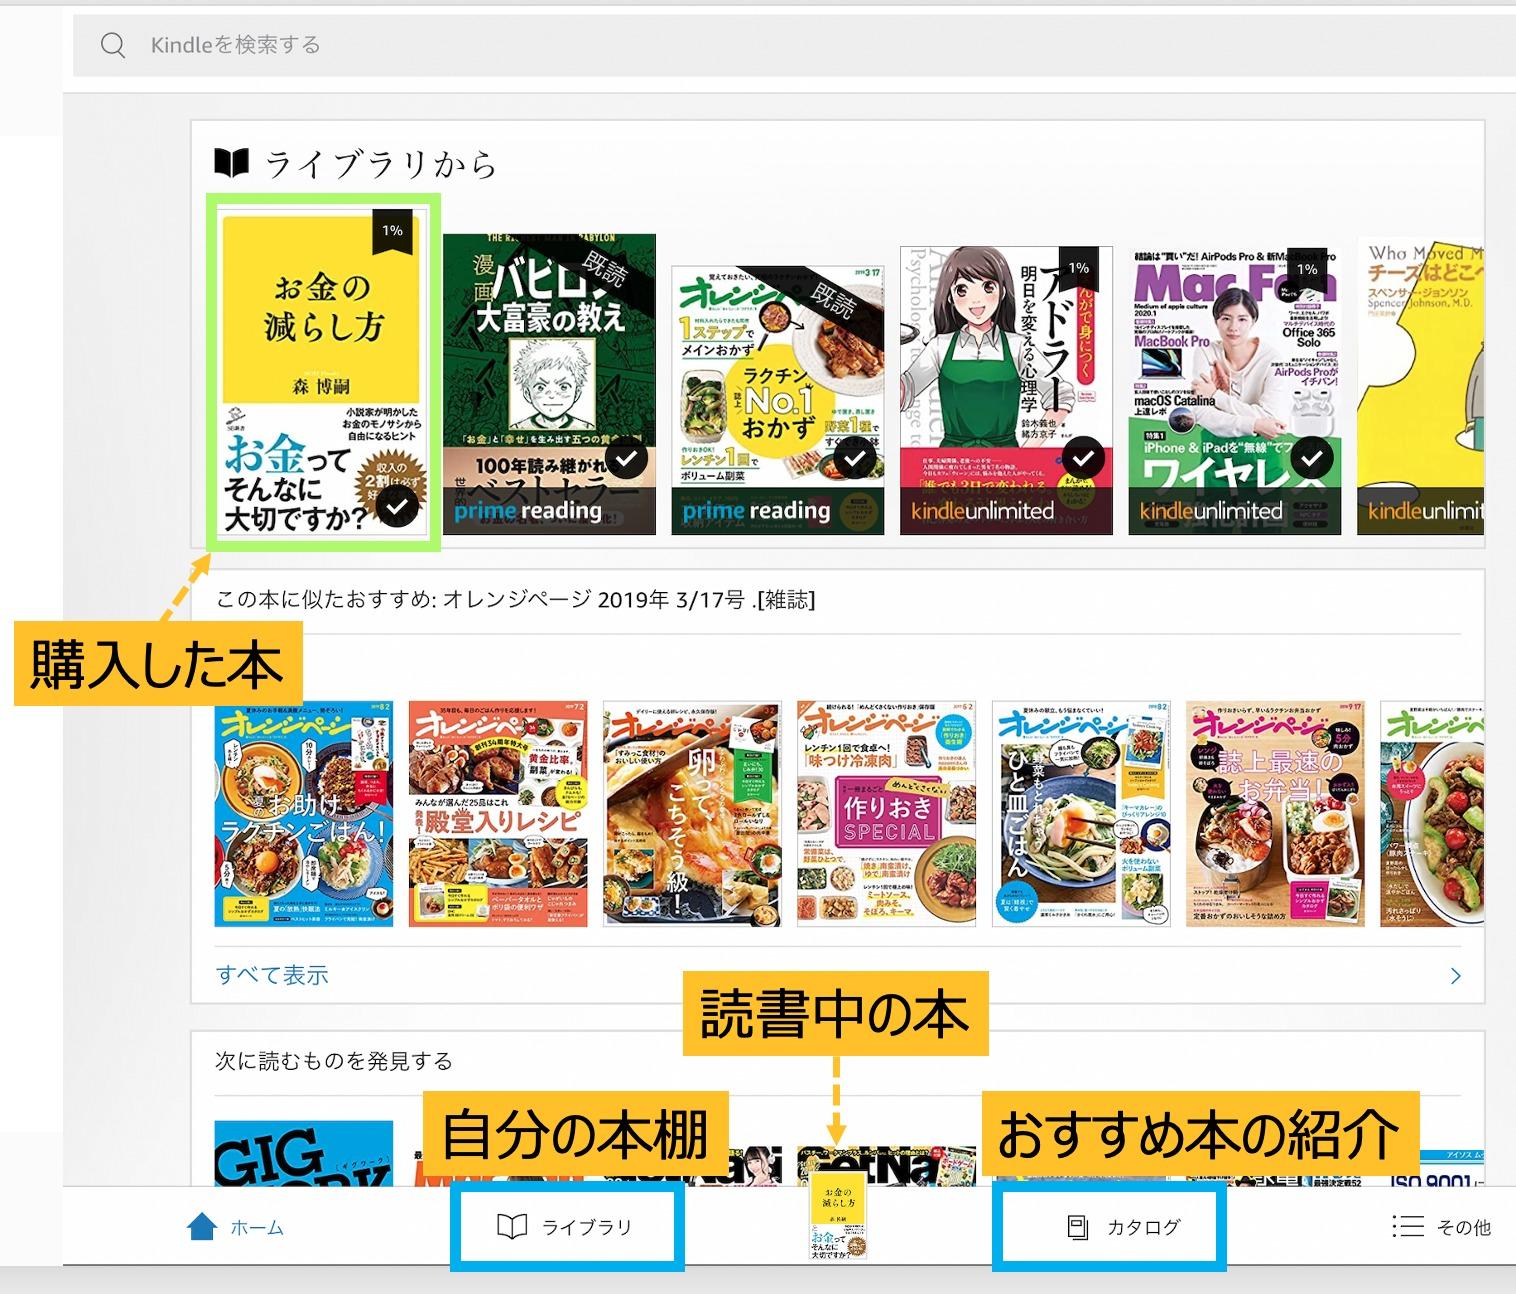 Kindleライブラリの図